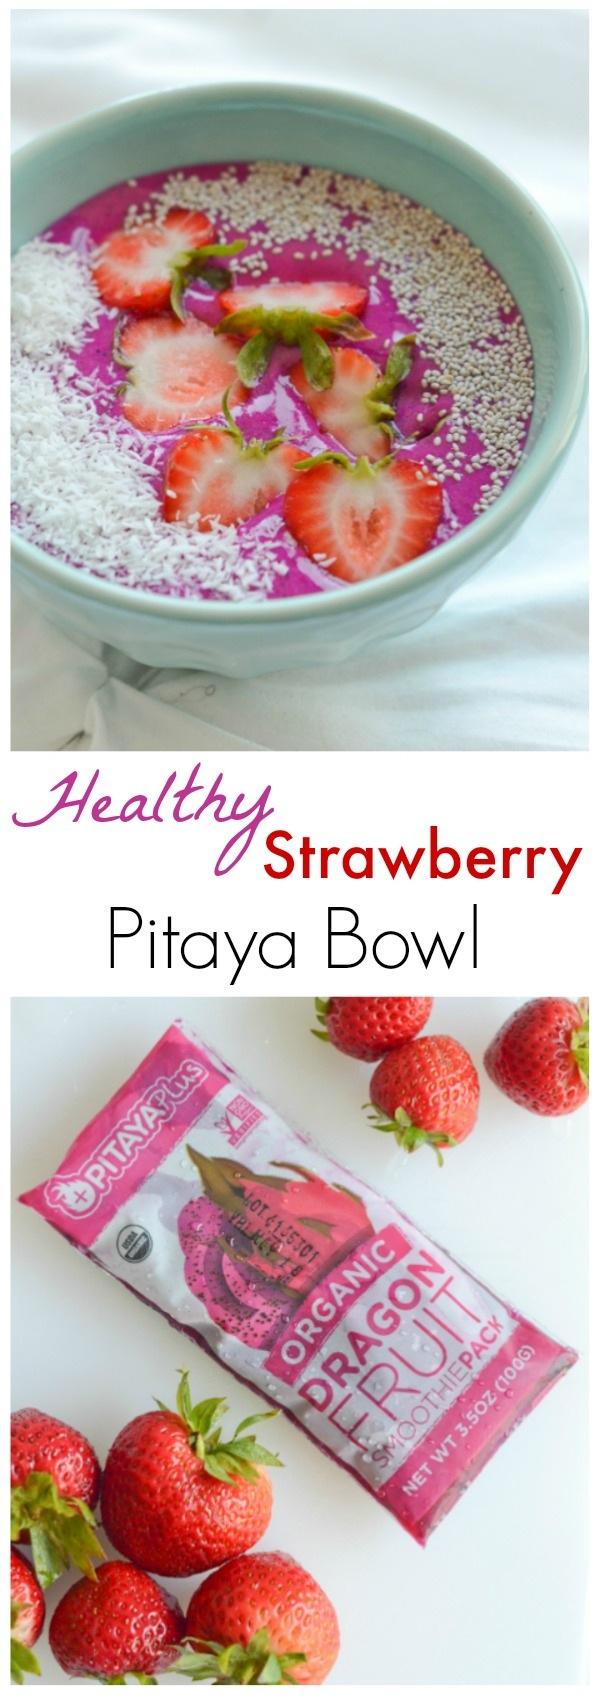 Healthy Strawberry Pitaya Bowl Recipe